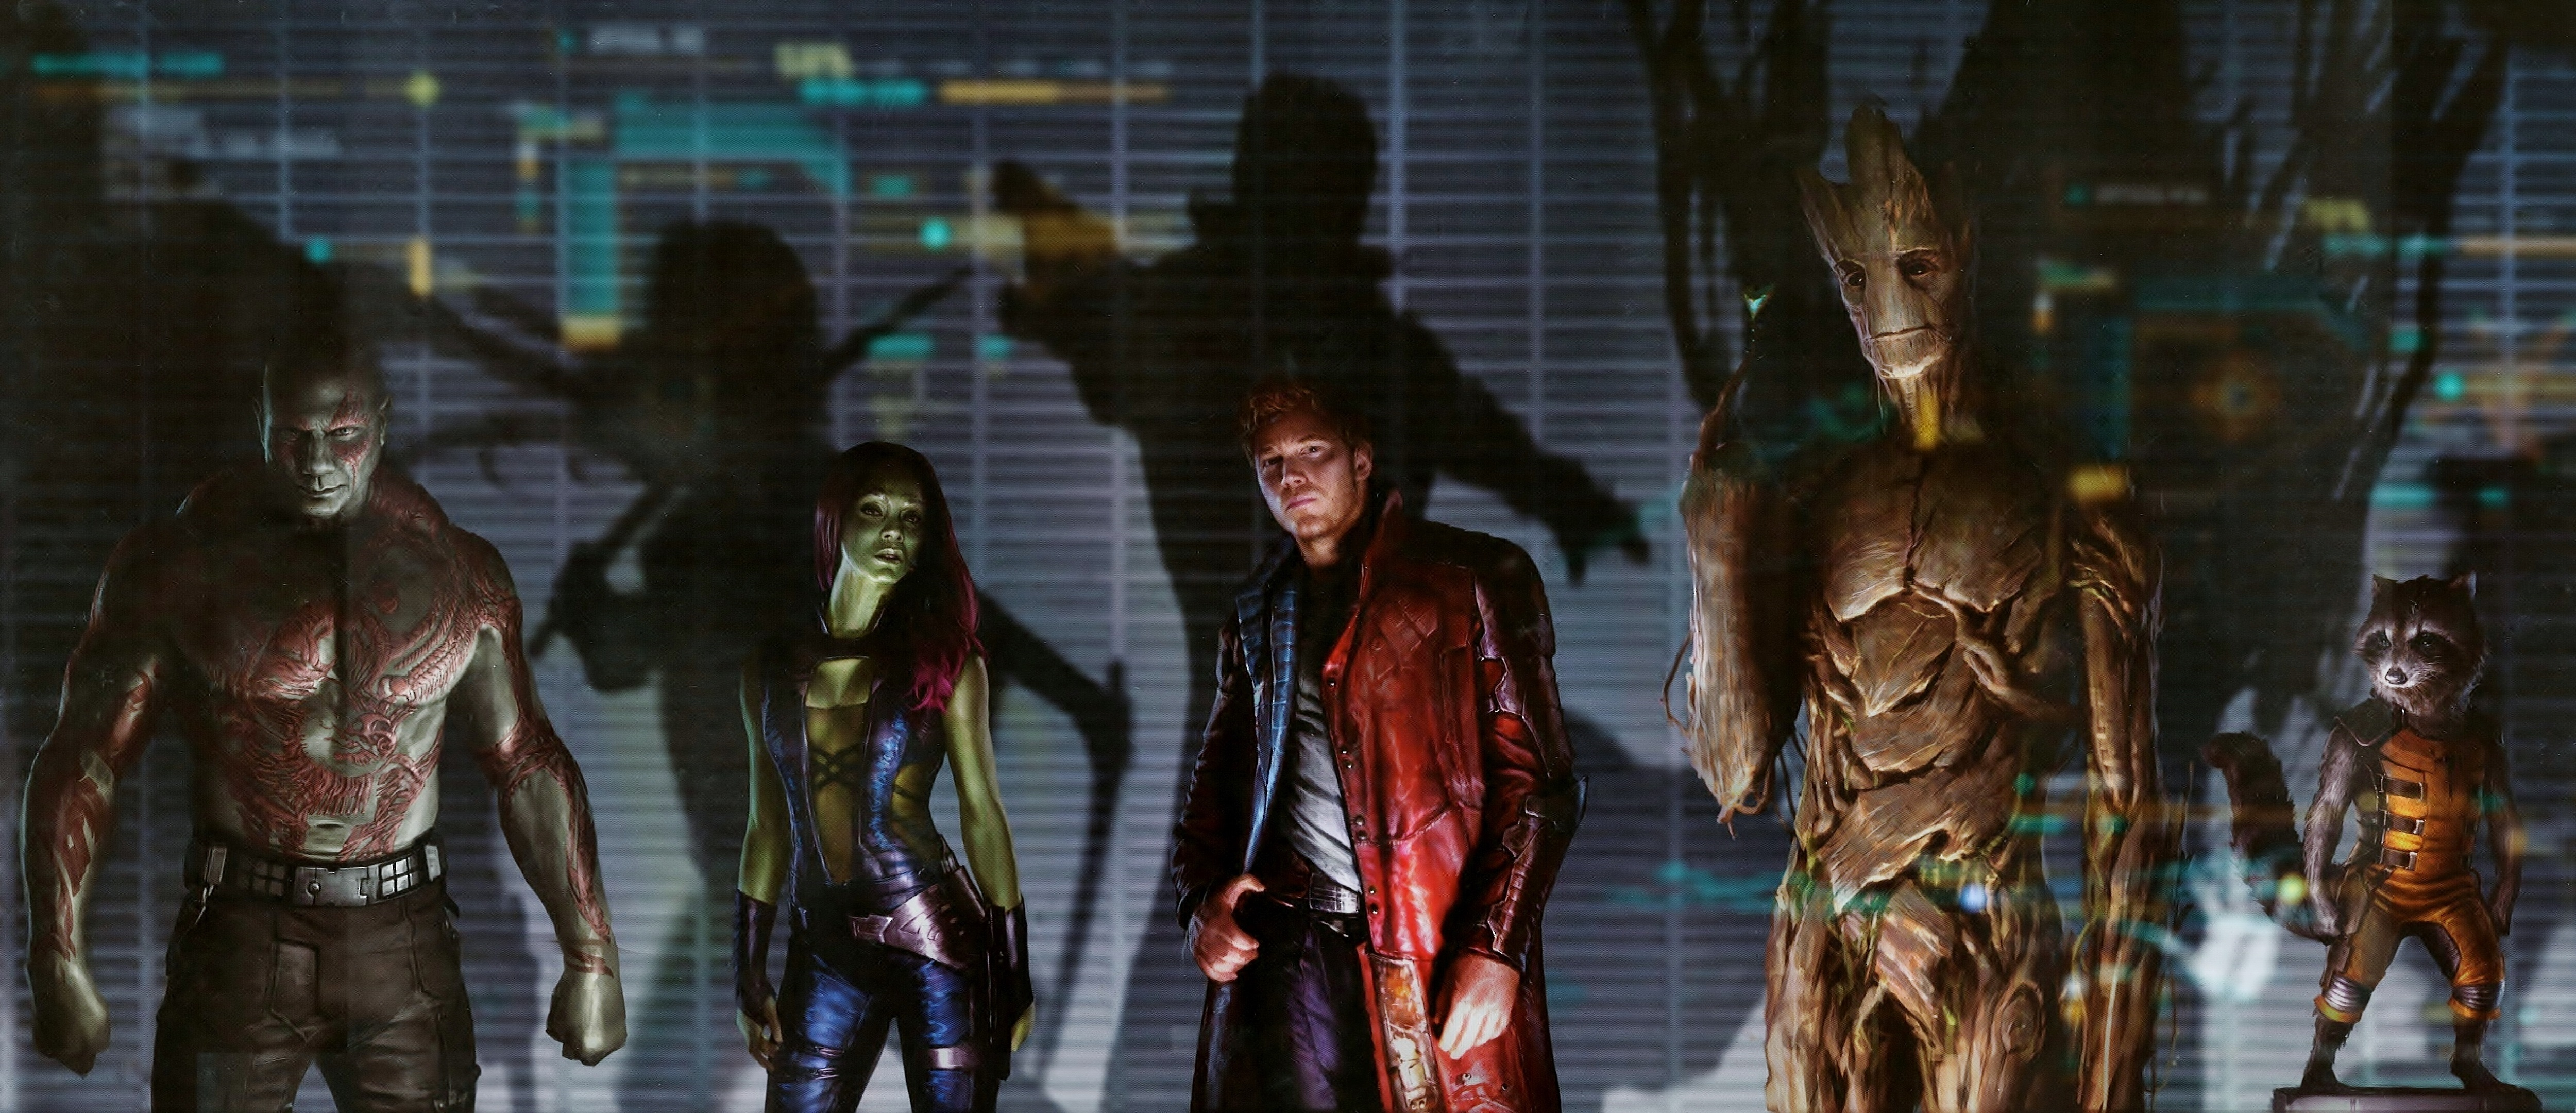 Guardians of the galaxy comics a go go comics movies music news